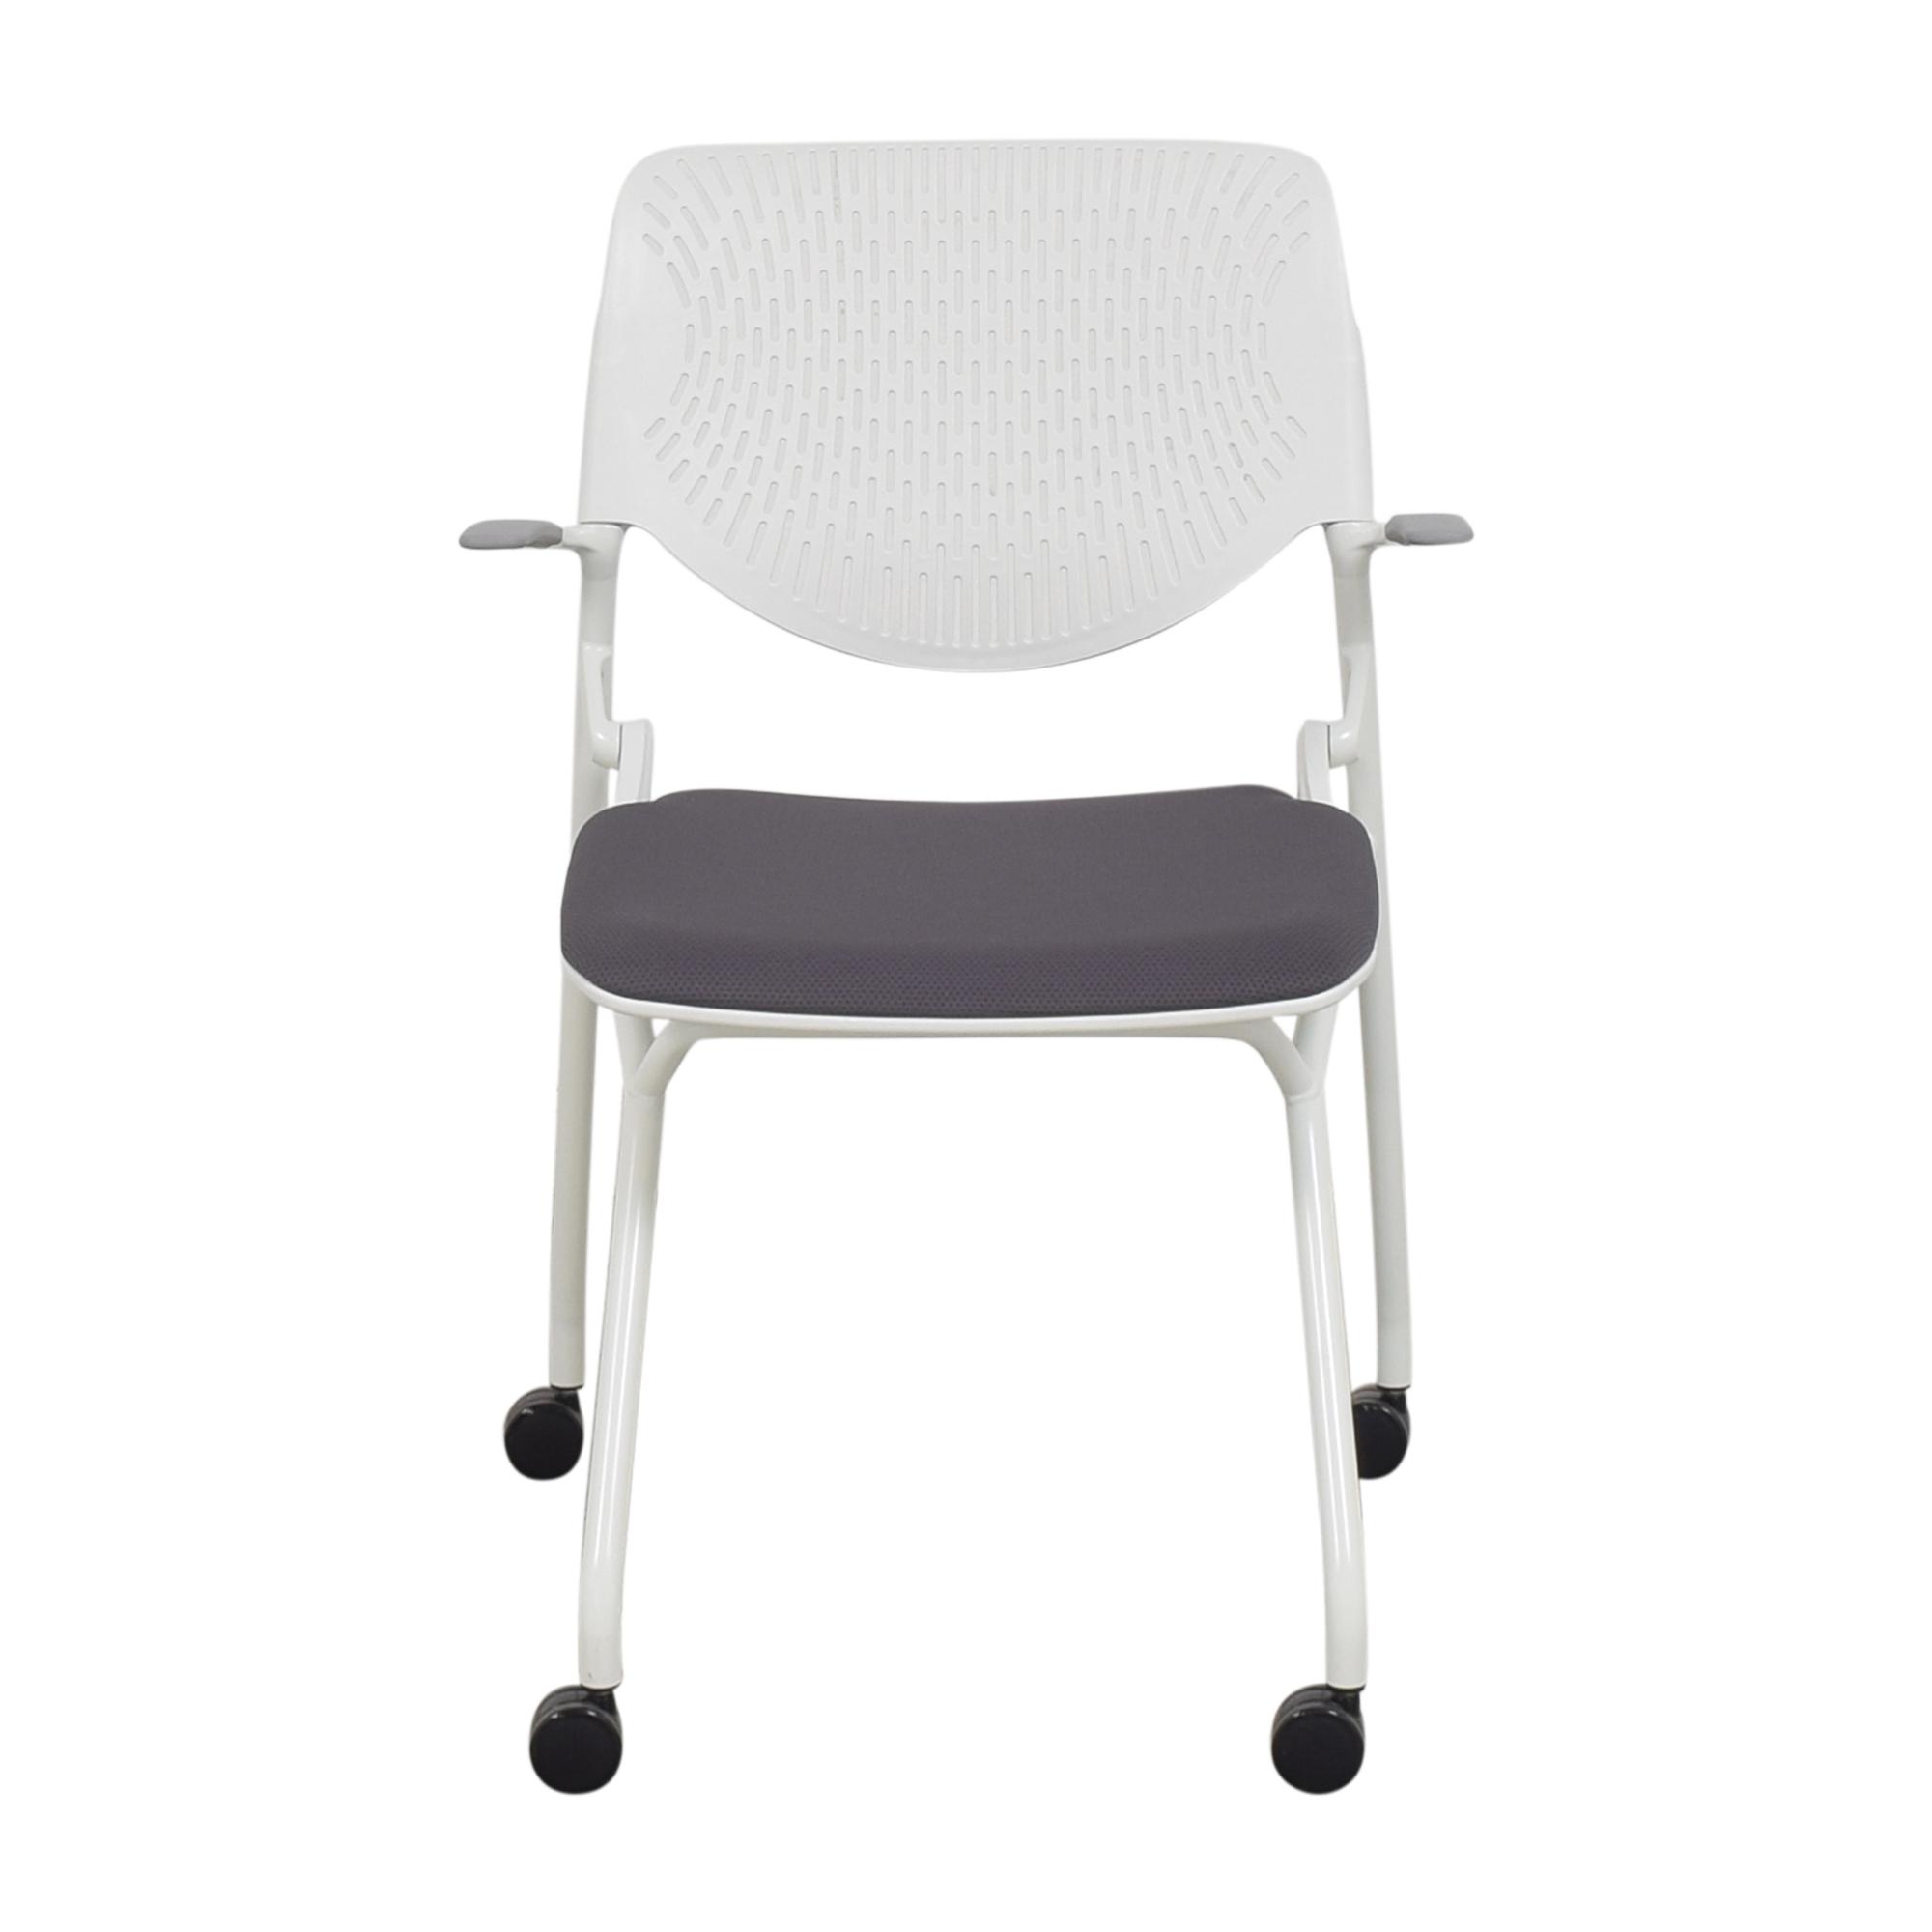 Room & Board Room & Board Runa Nesting Chair by Okamura used